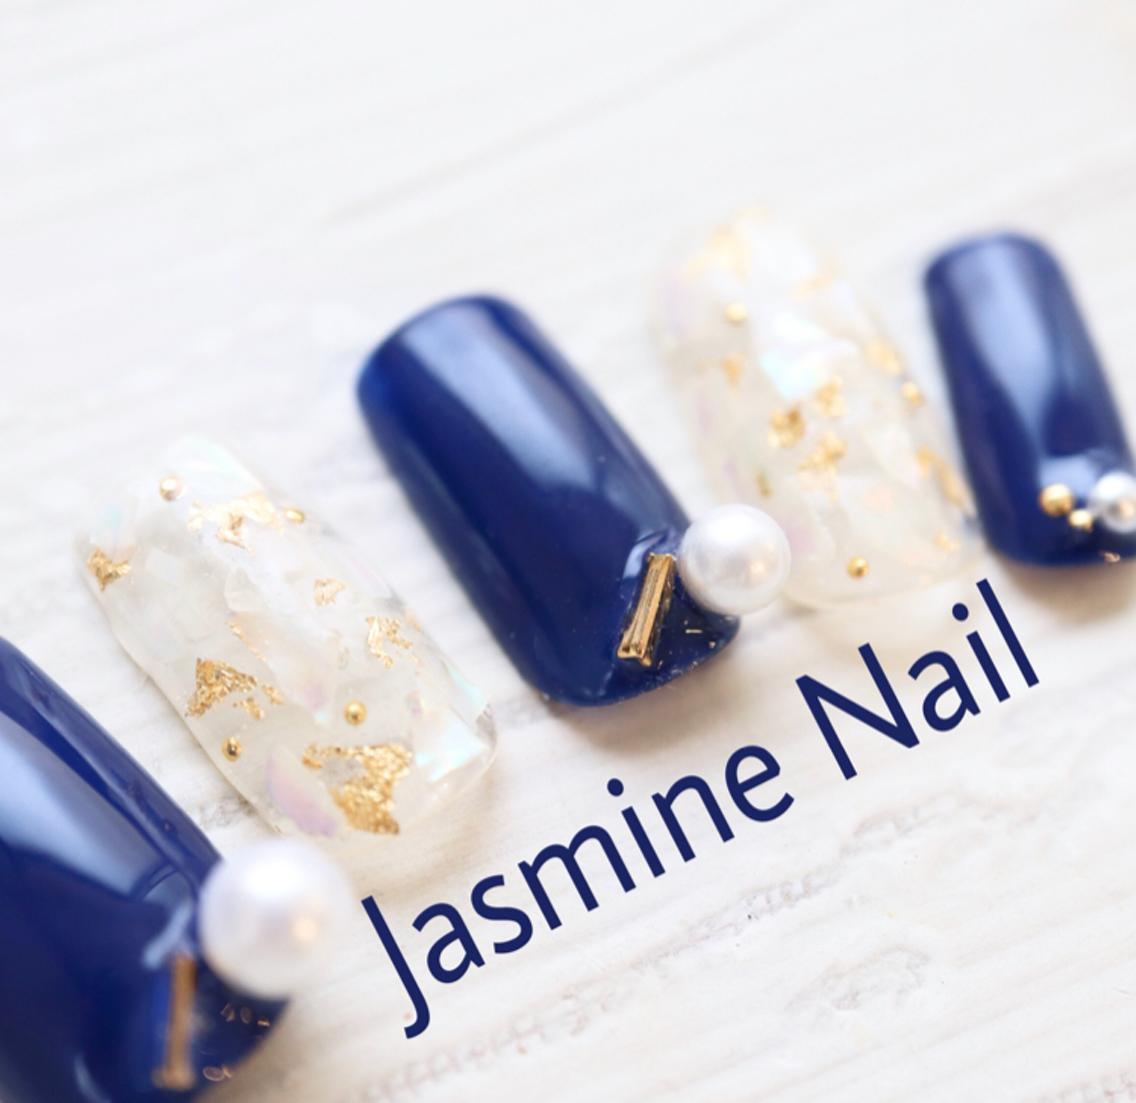 Jasmine Nail所属・JasmineNailの掲載